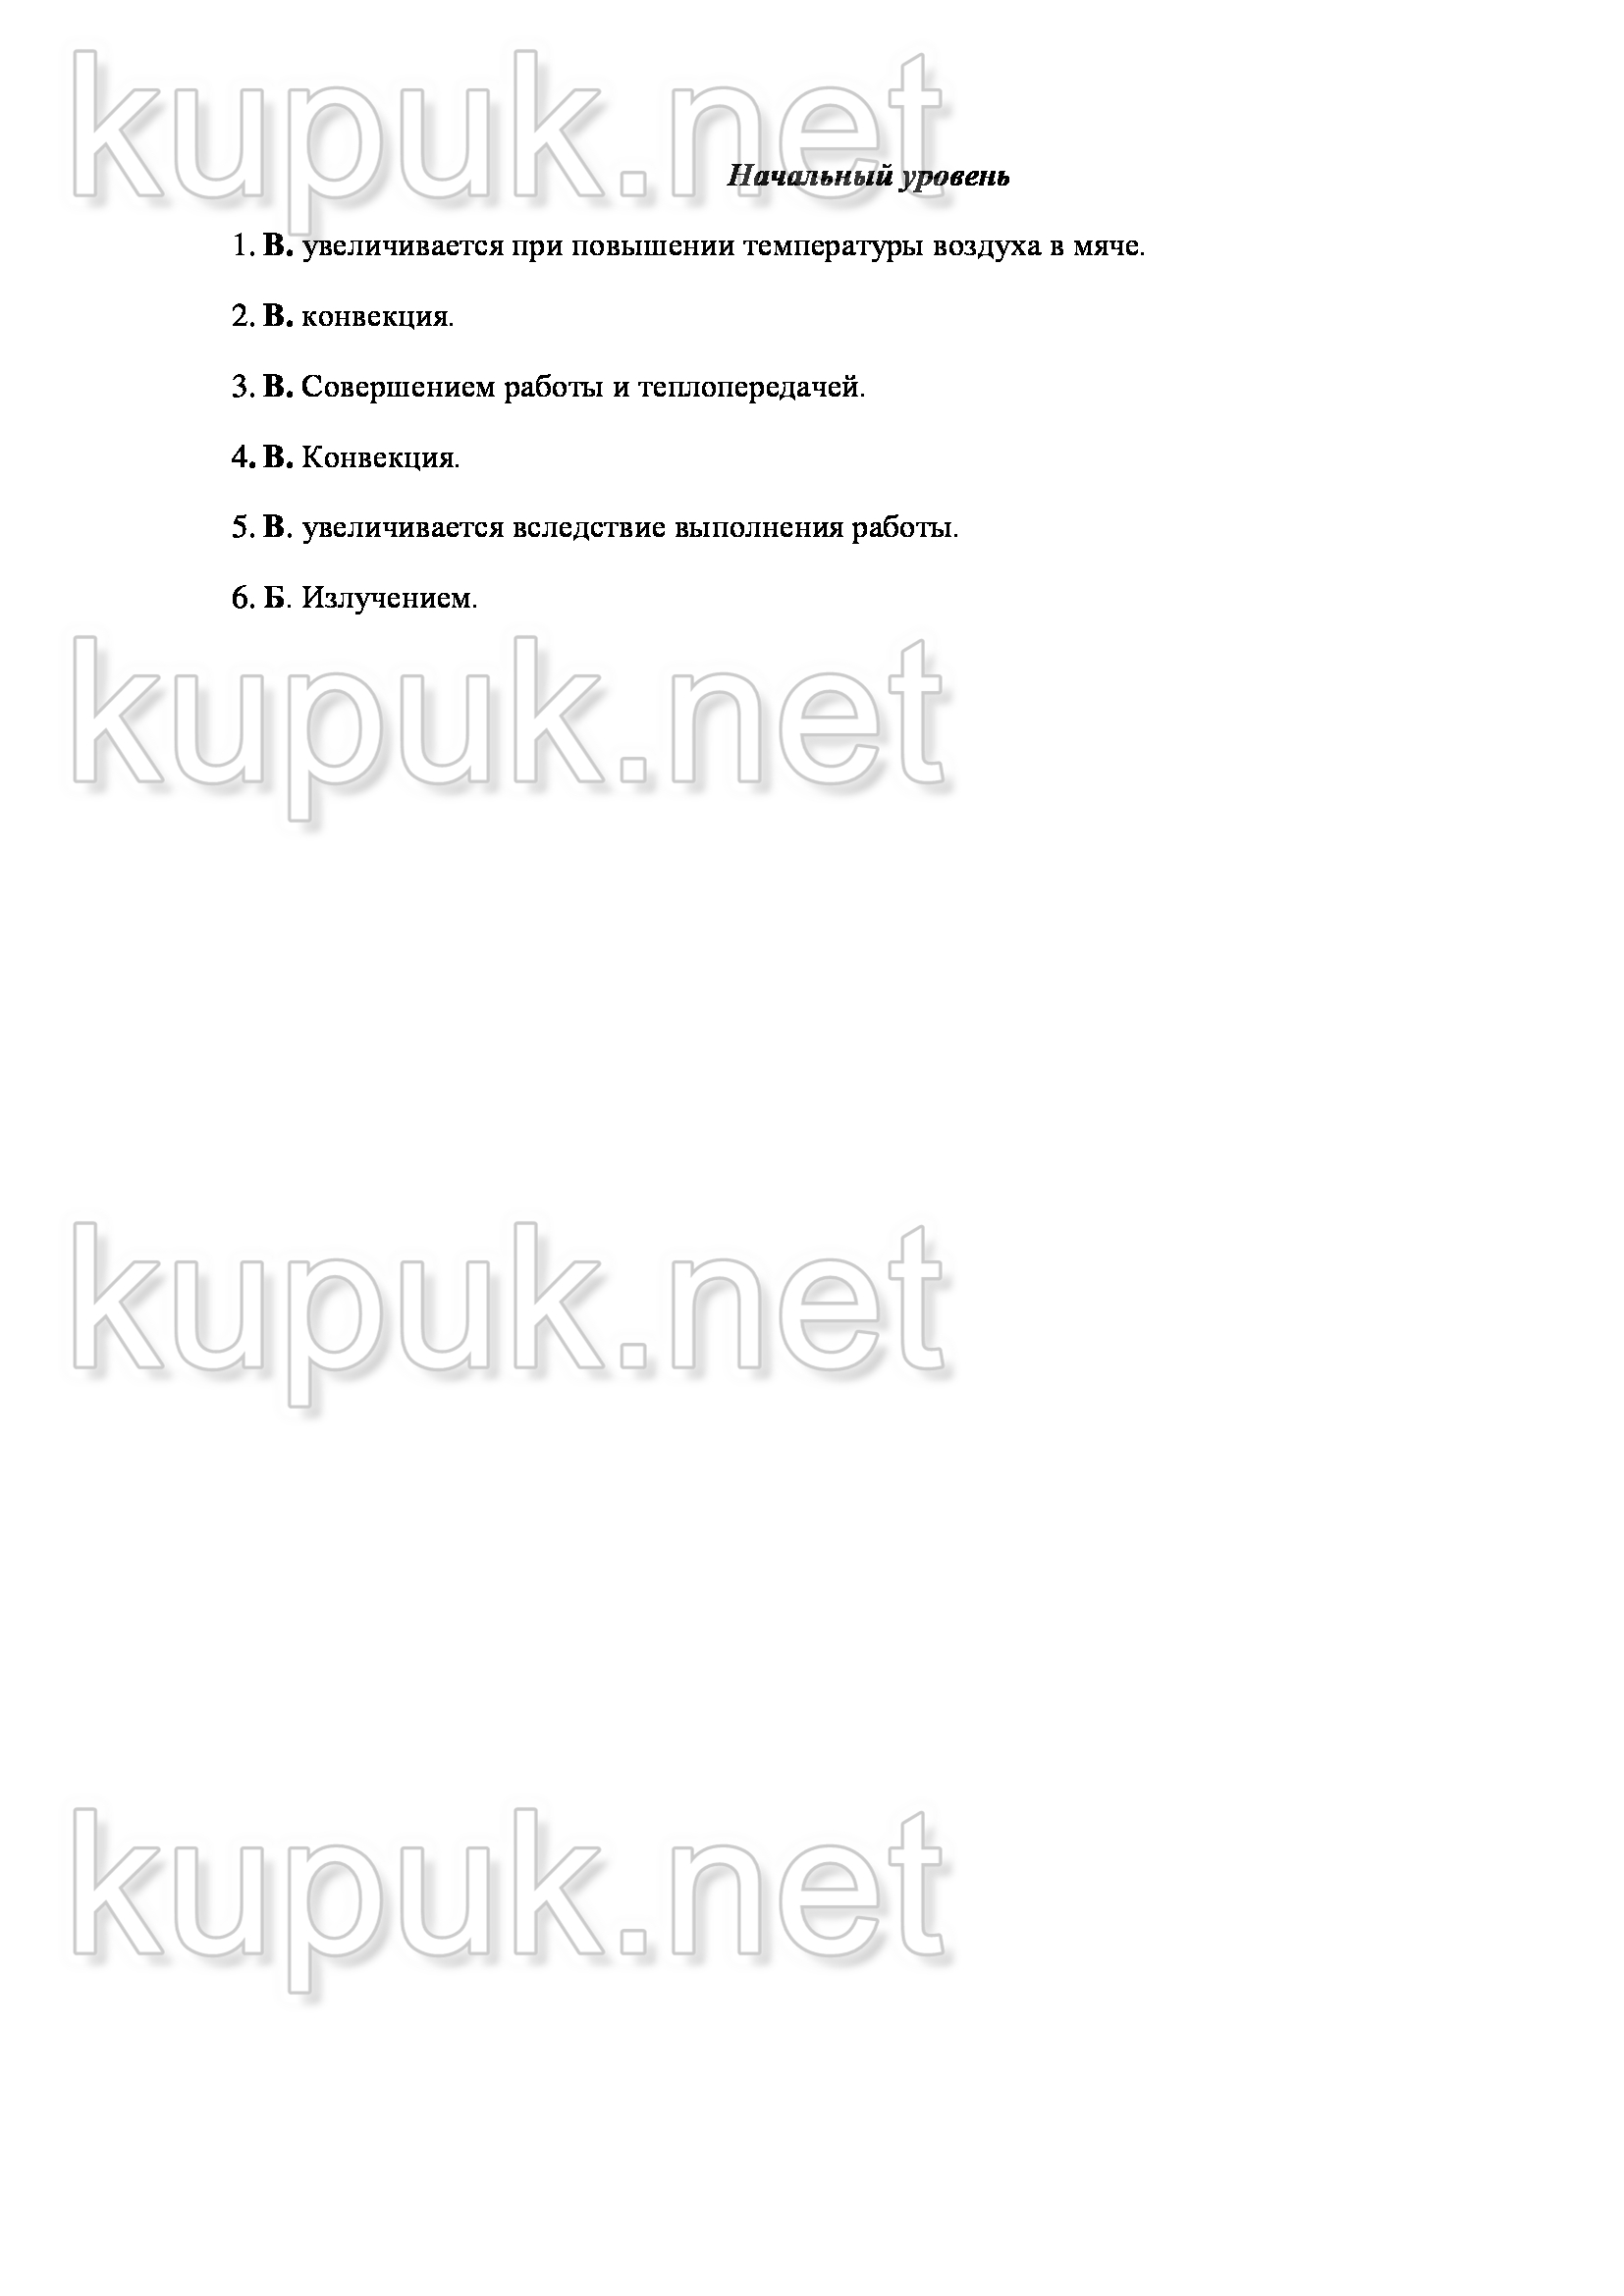 Л Кирик Решебник По Физики 11 Класс